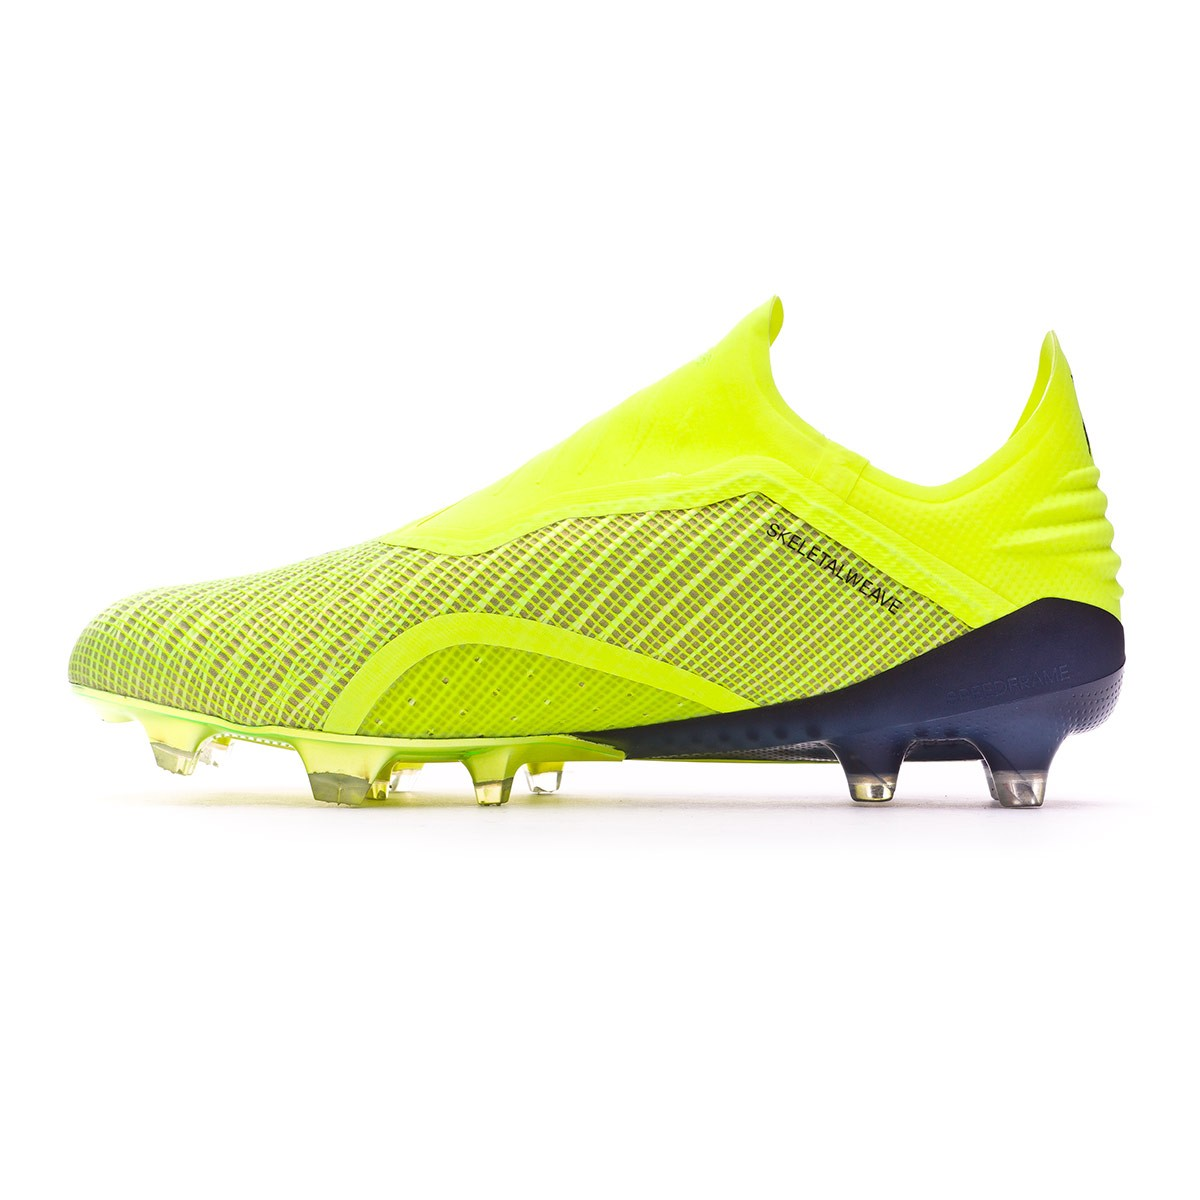 e37fe64f2 Football Boots adidas X 18+ FG Solar yellow-Core black-White - Tienda de  fútbol Fútbol Emotion